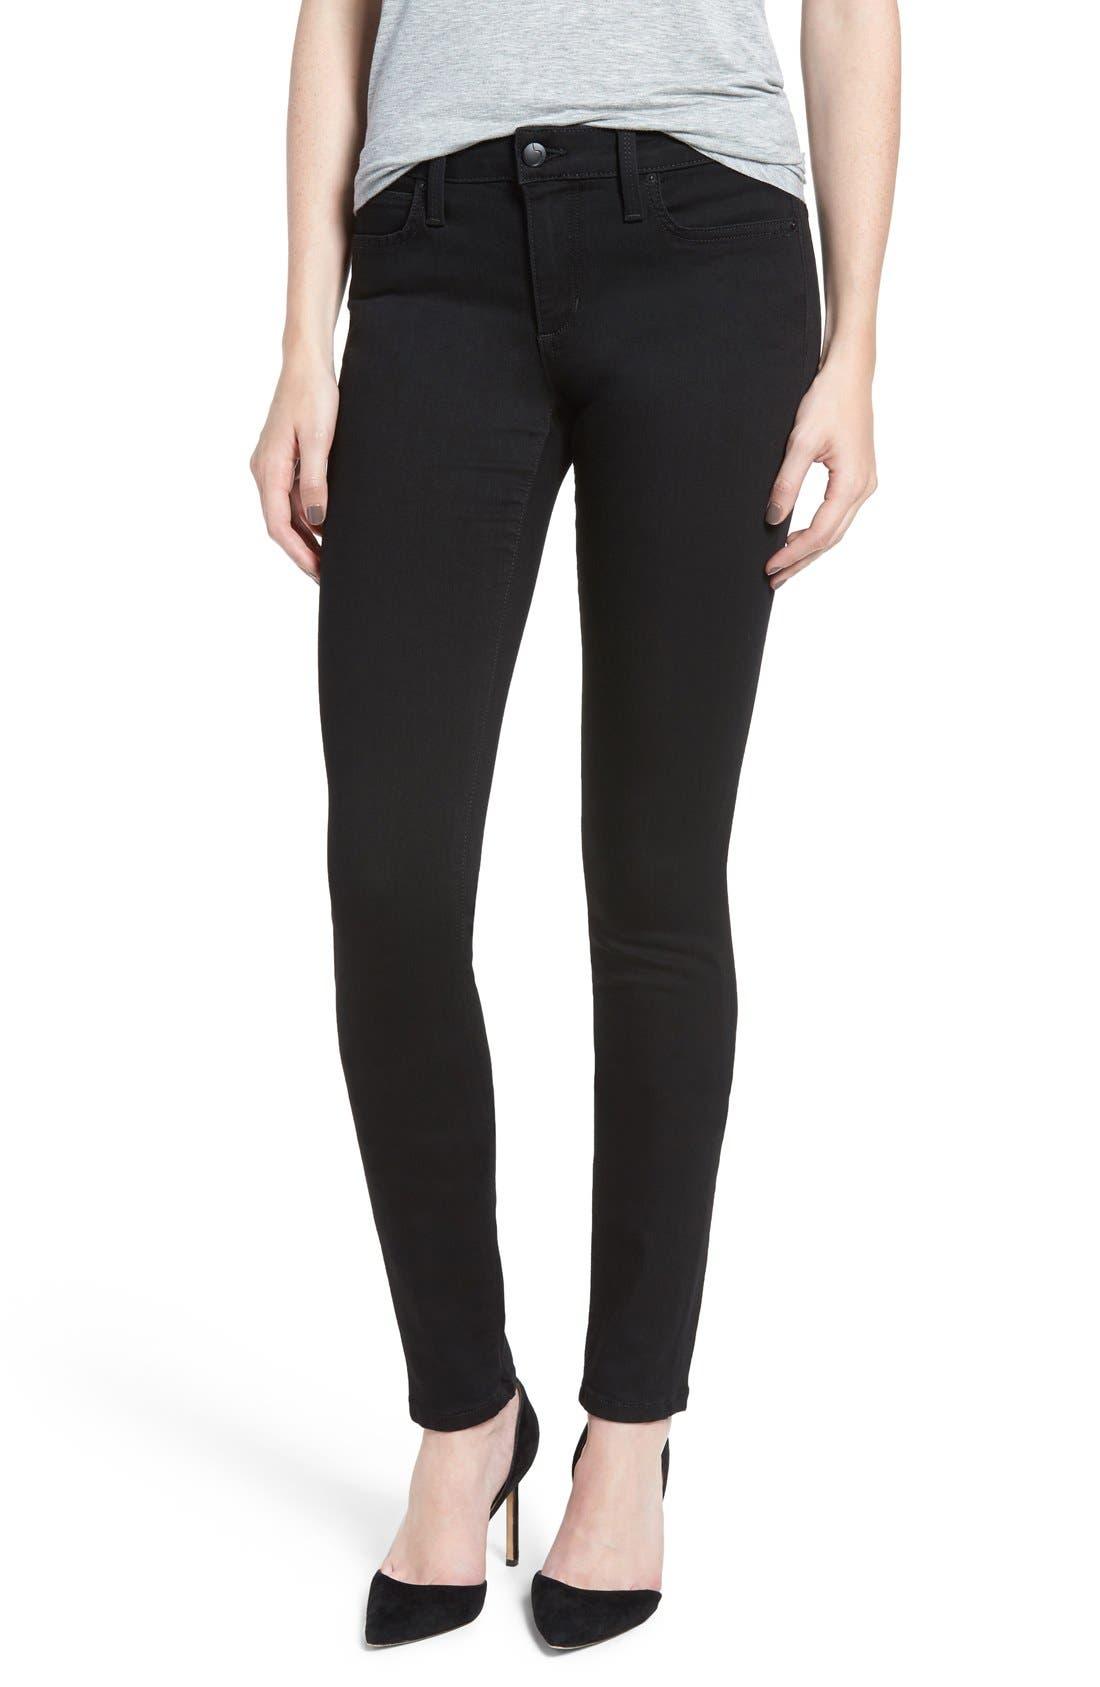 'Flawless - Twiggy' Skinny Jeans in Regan